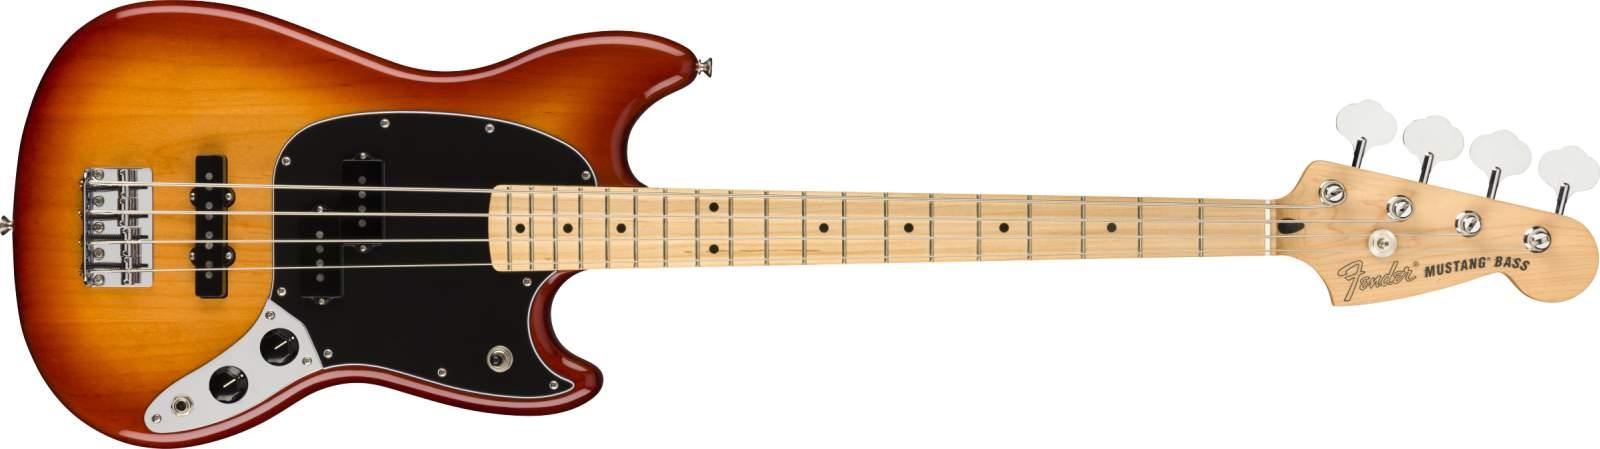 Fender Player Mustang Bass PJ PF SSB